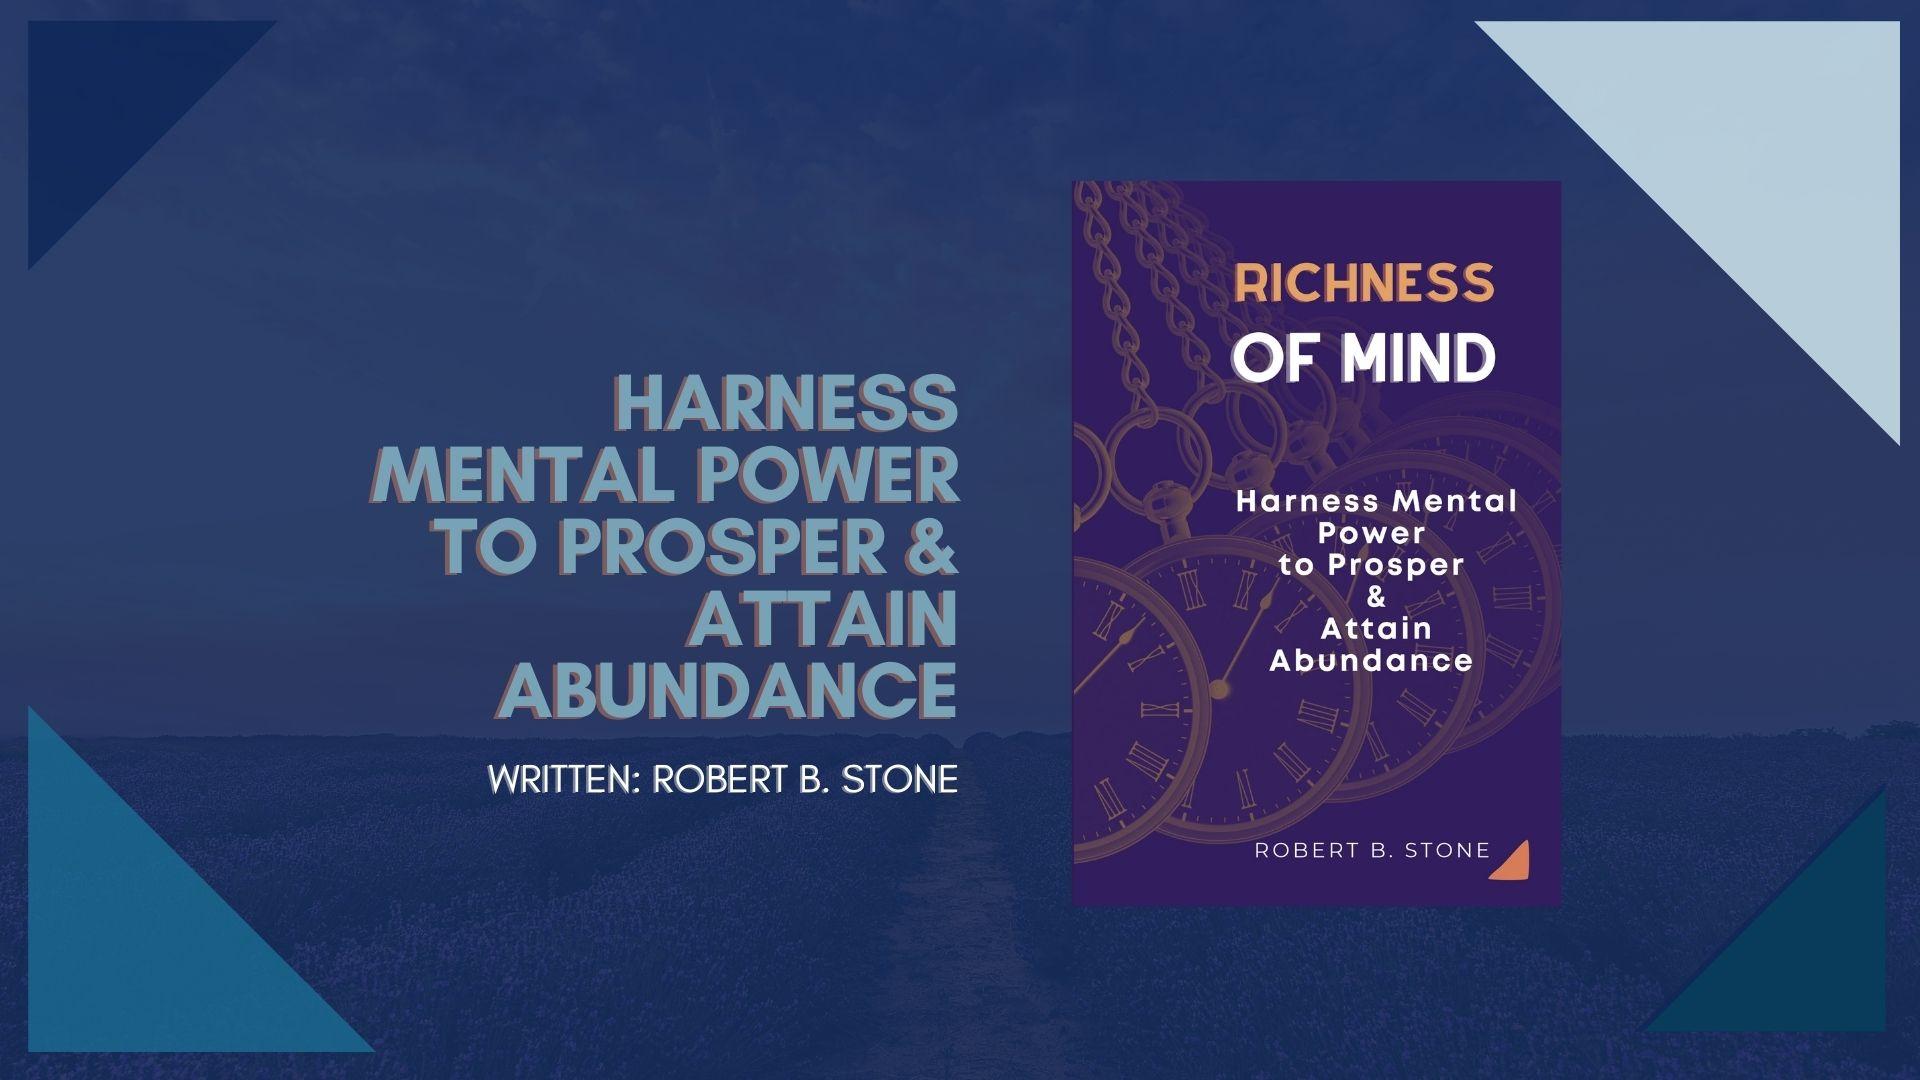 Richness of Mind